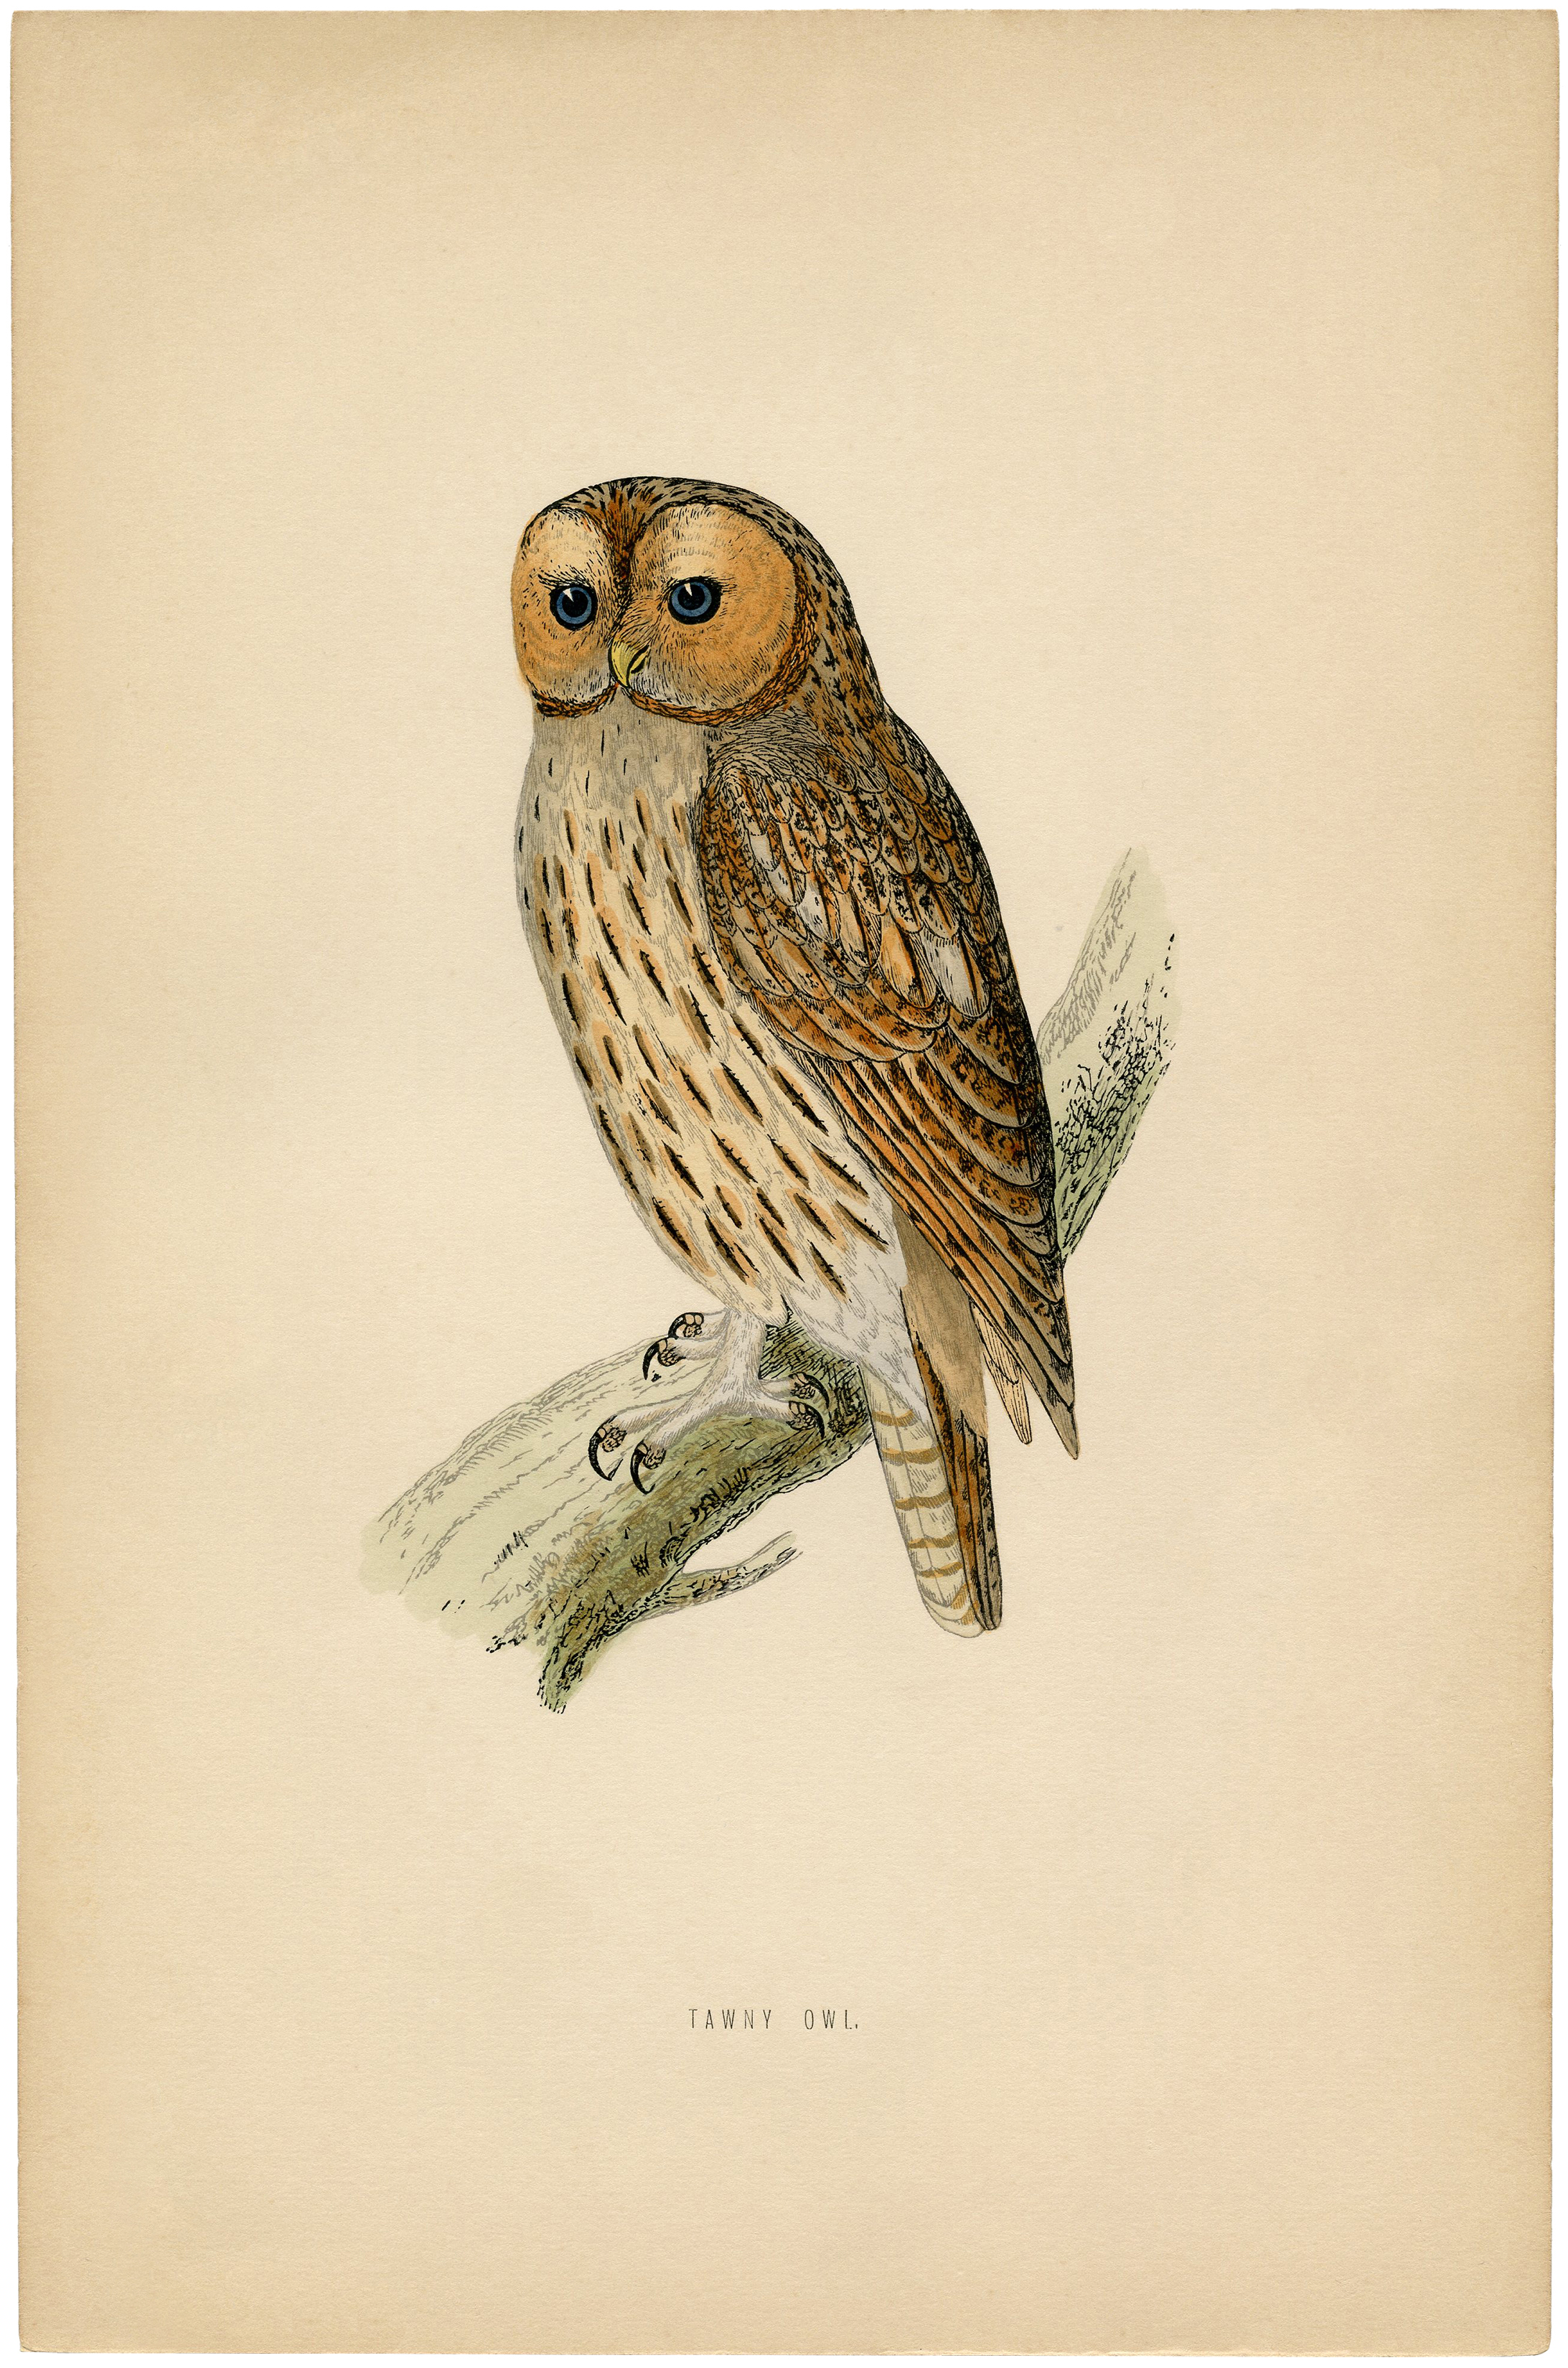 Vintage owl wallpaper - photo#5